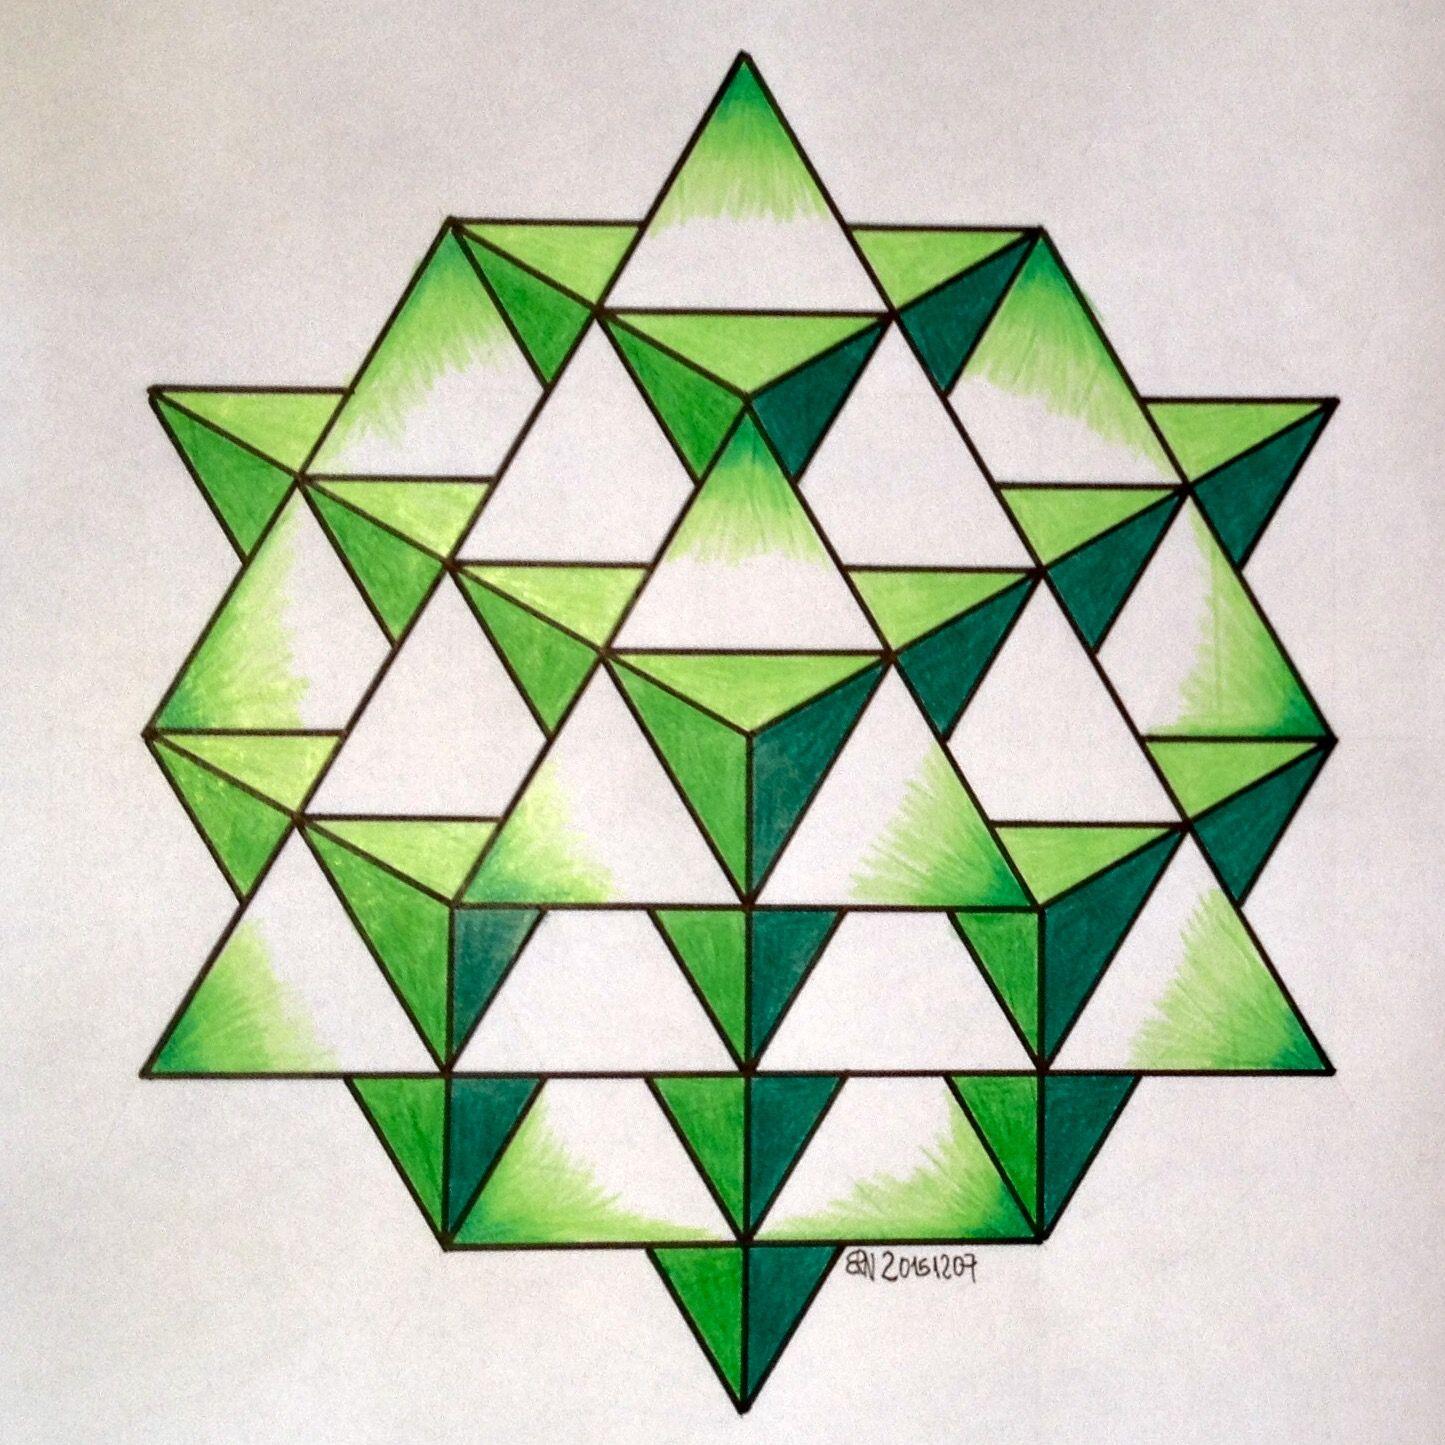 #Regolo54 #Solid #Polyhedra #Star #Pentagon #Geometry #Symmetry #Pattern